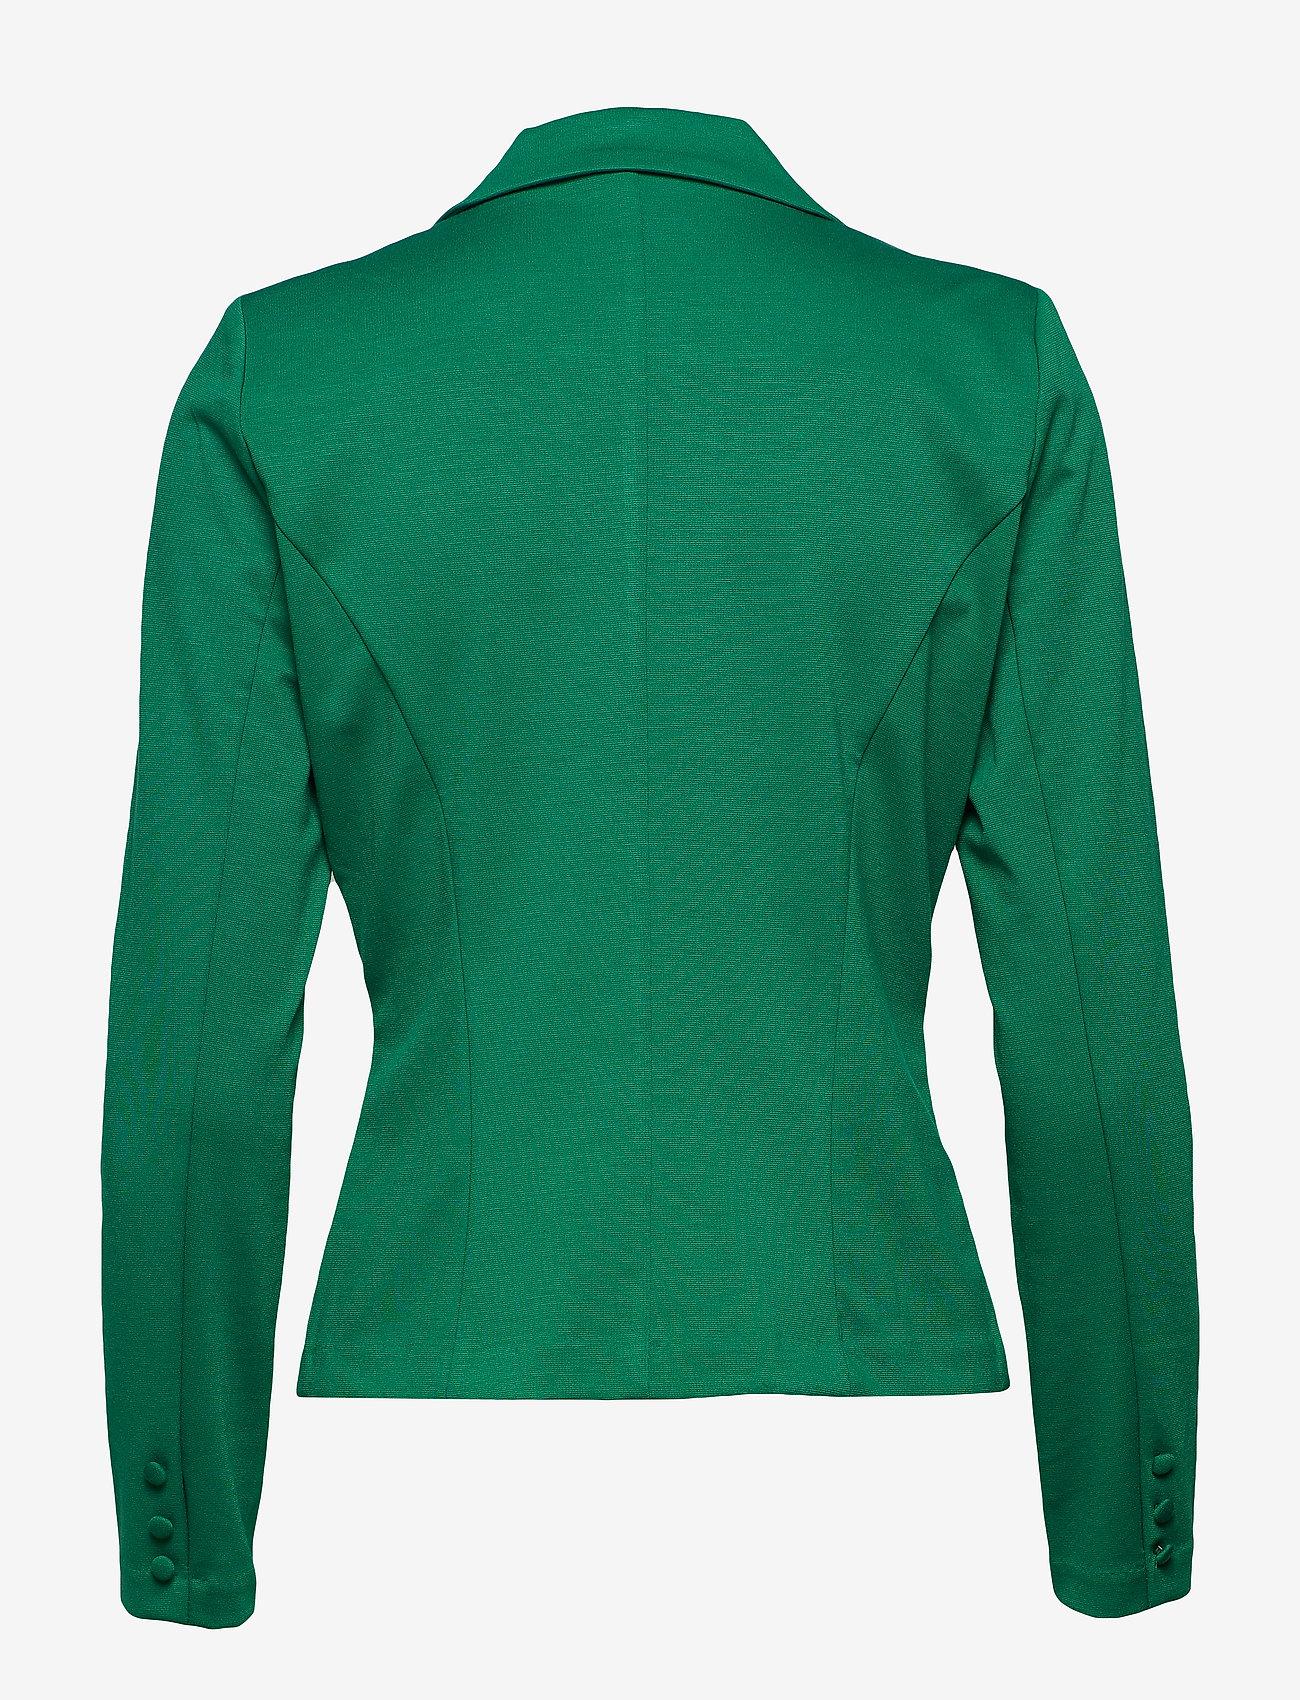 FREE/QUENT - FQNANNI-JA - casual blazere - forrest green - 1